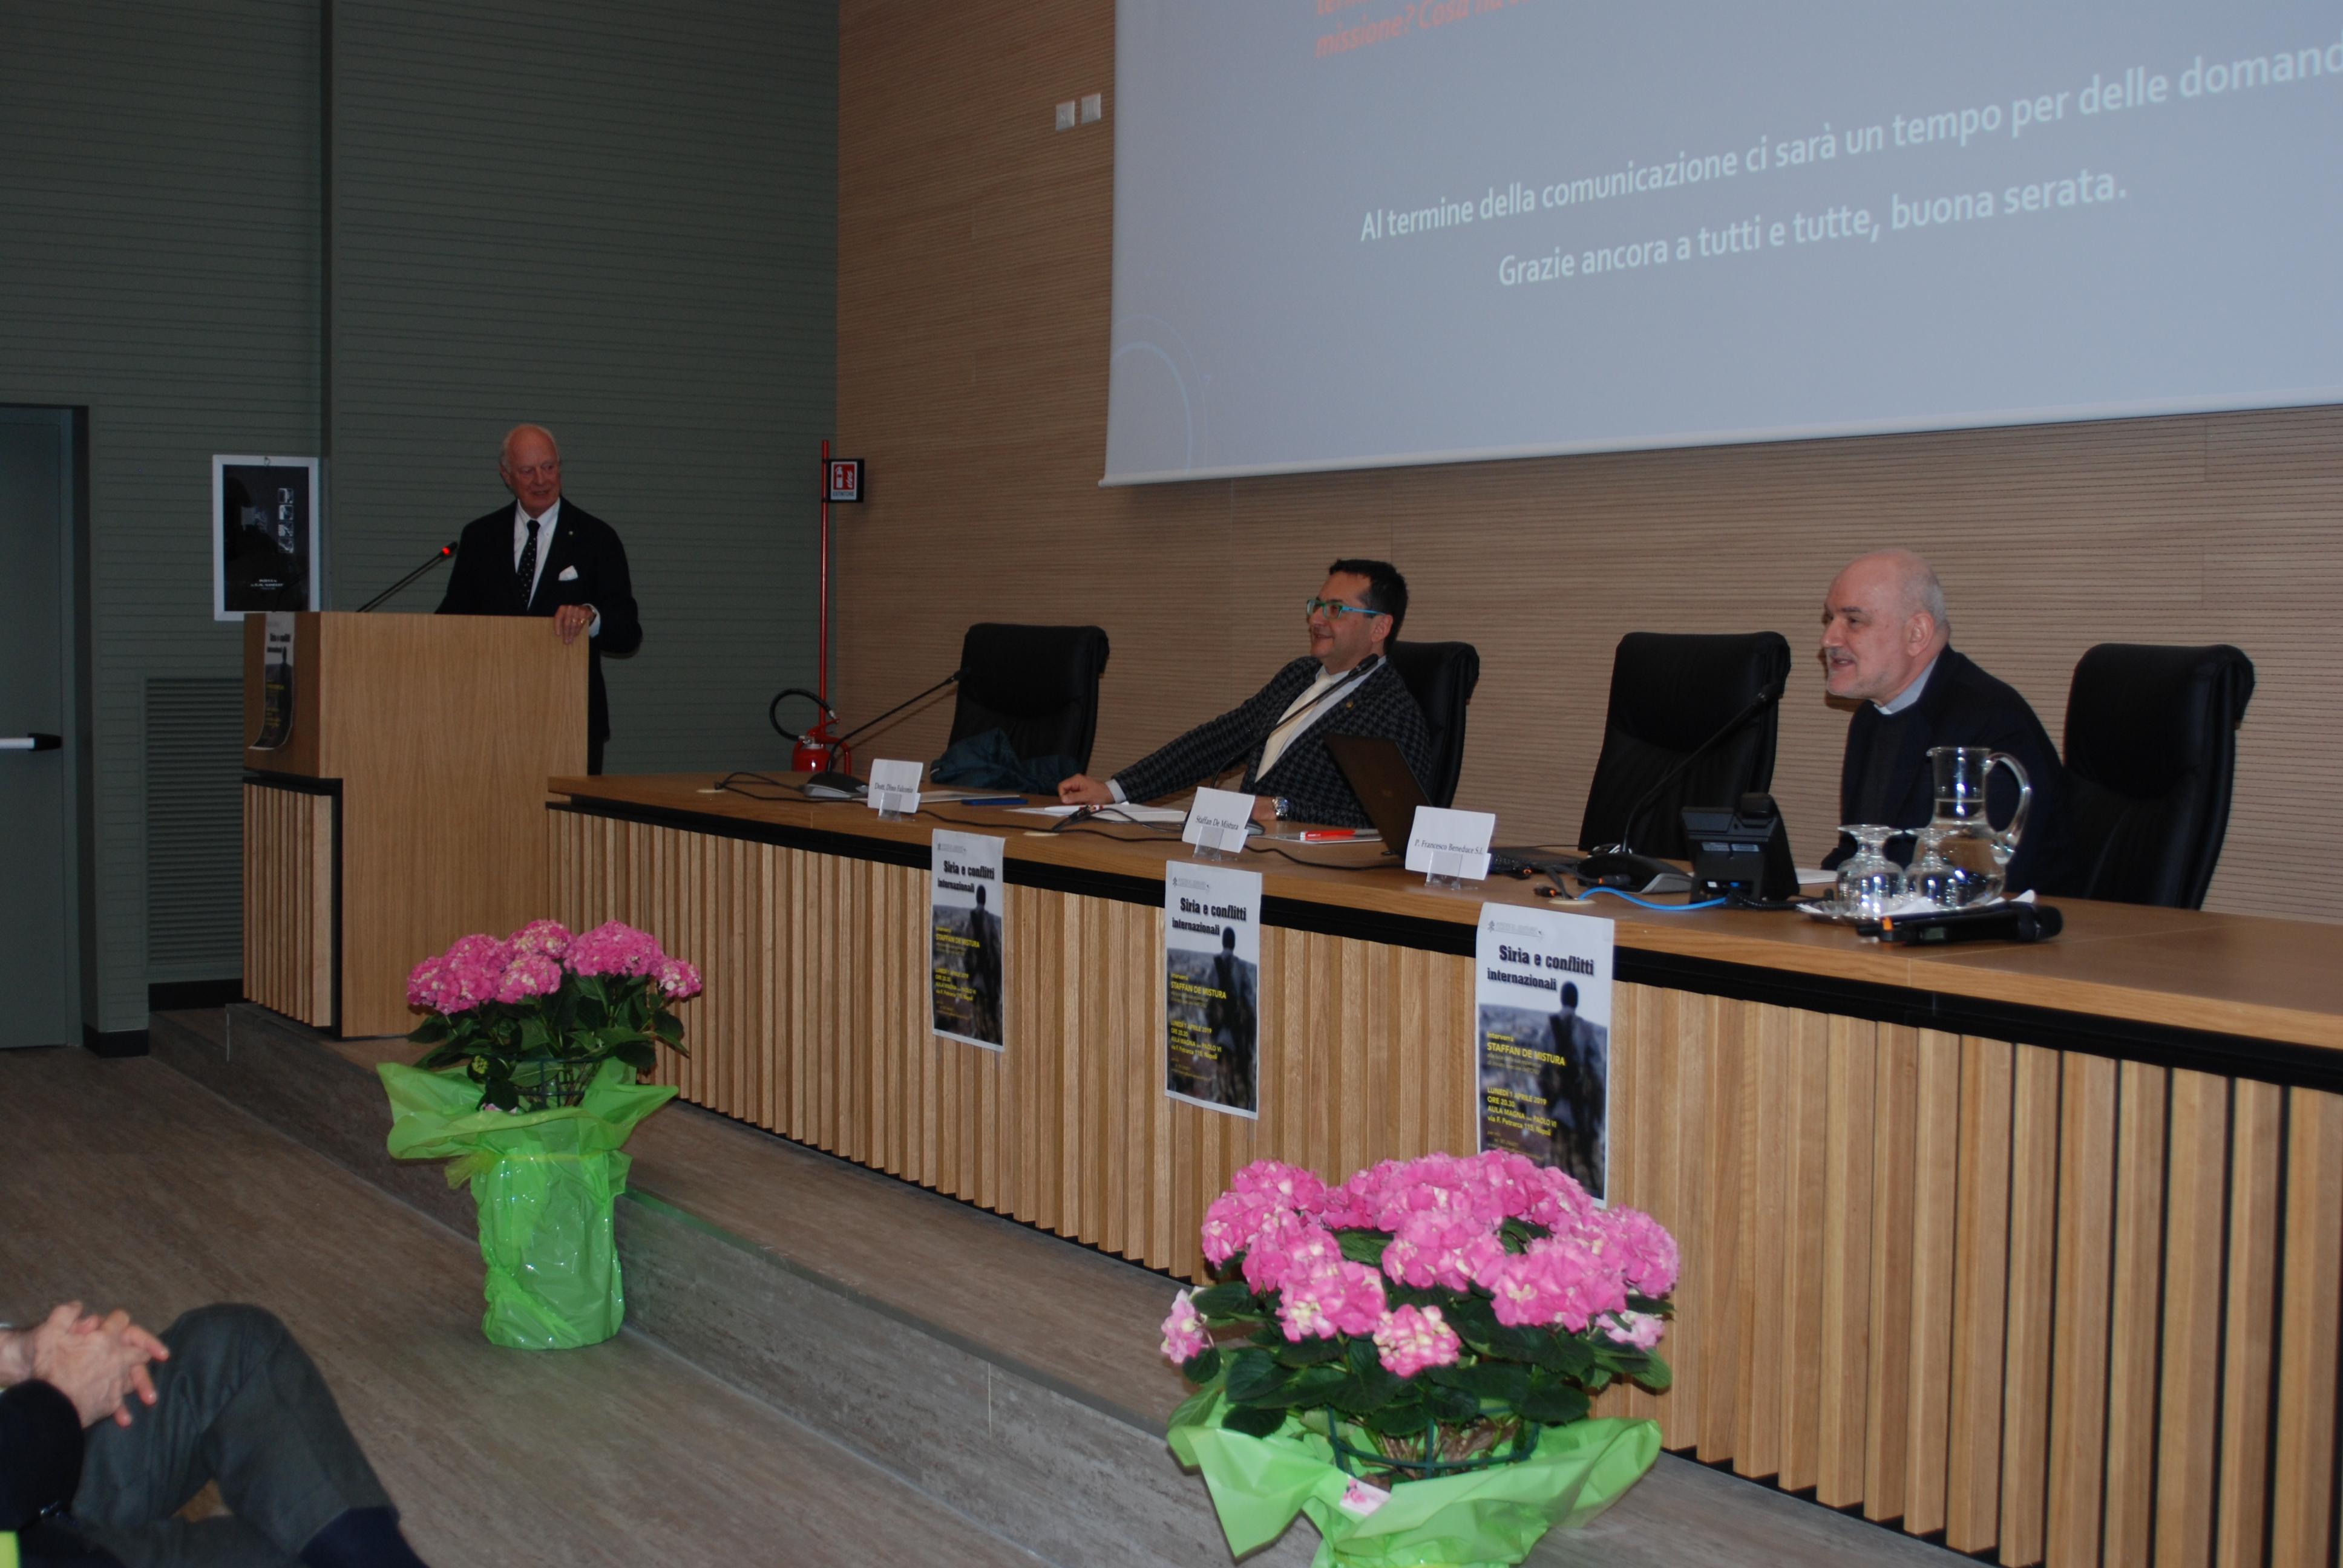 Staffan de Mistura in seminario (25)